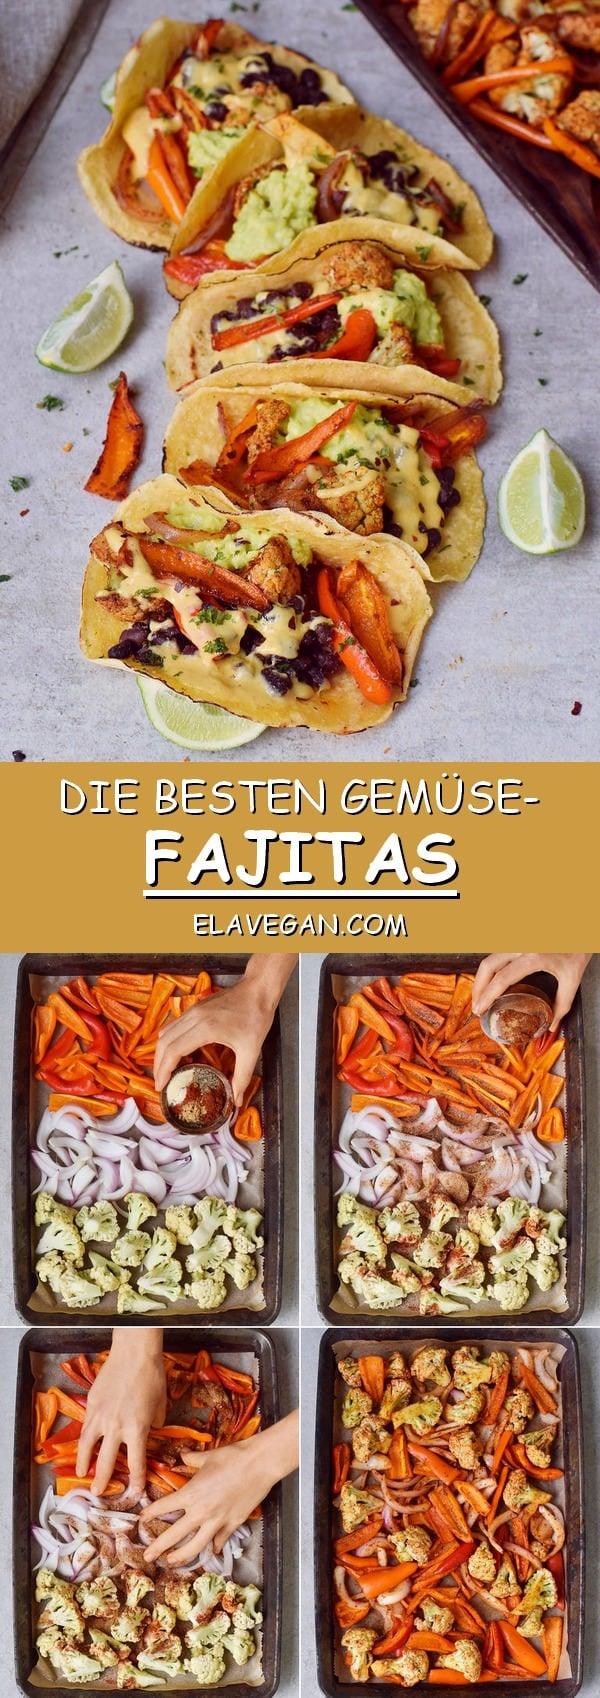 Die besten Gemüse Fajitas mit Paprikas, schwarzen Bohnen, Blumenkohl, Guacamole, veganem Käse